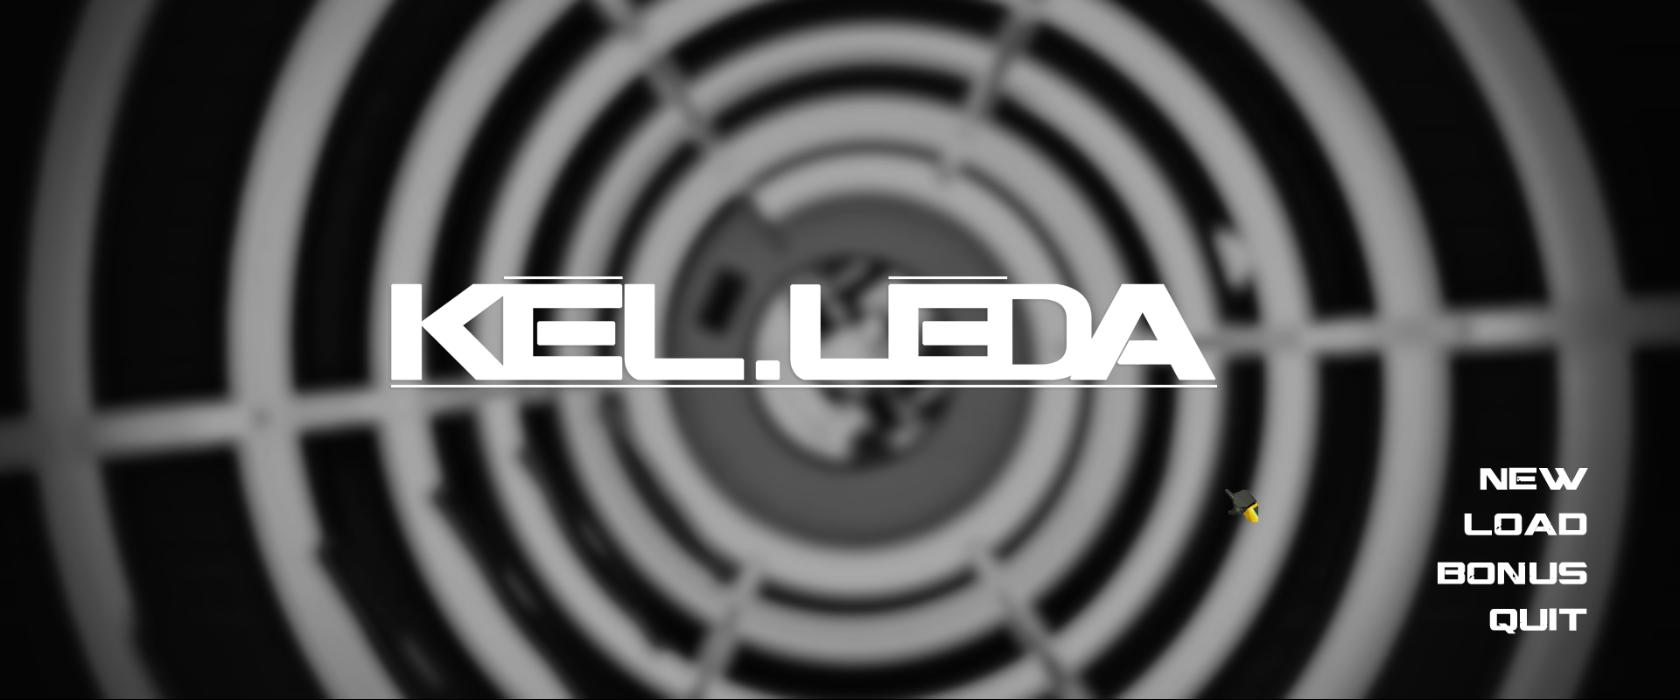 Kel Leda (Adventure Jam 2017) [Simon] - Page 3 Filename_2017-05-18_16h-02m-17s-e6eyajev